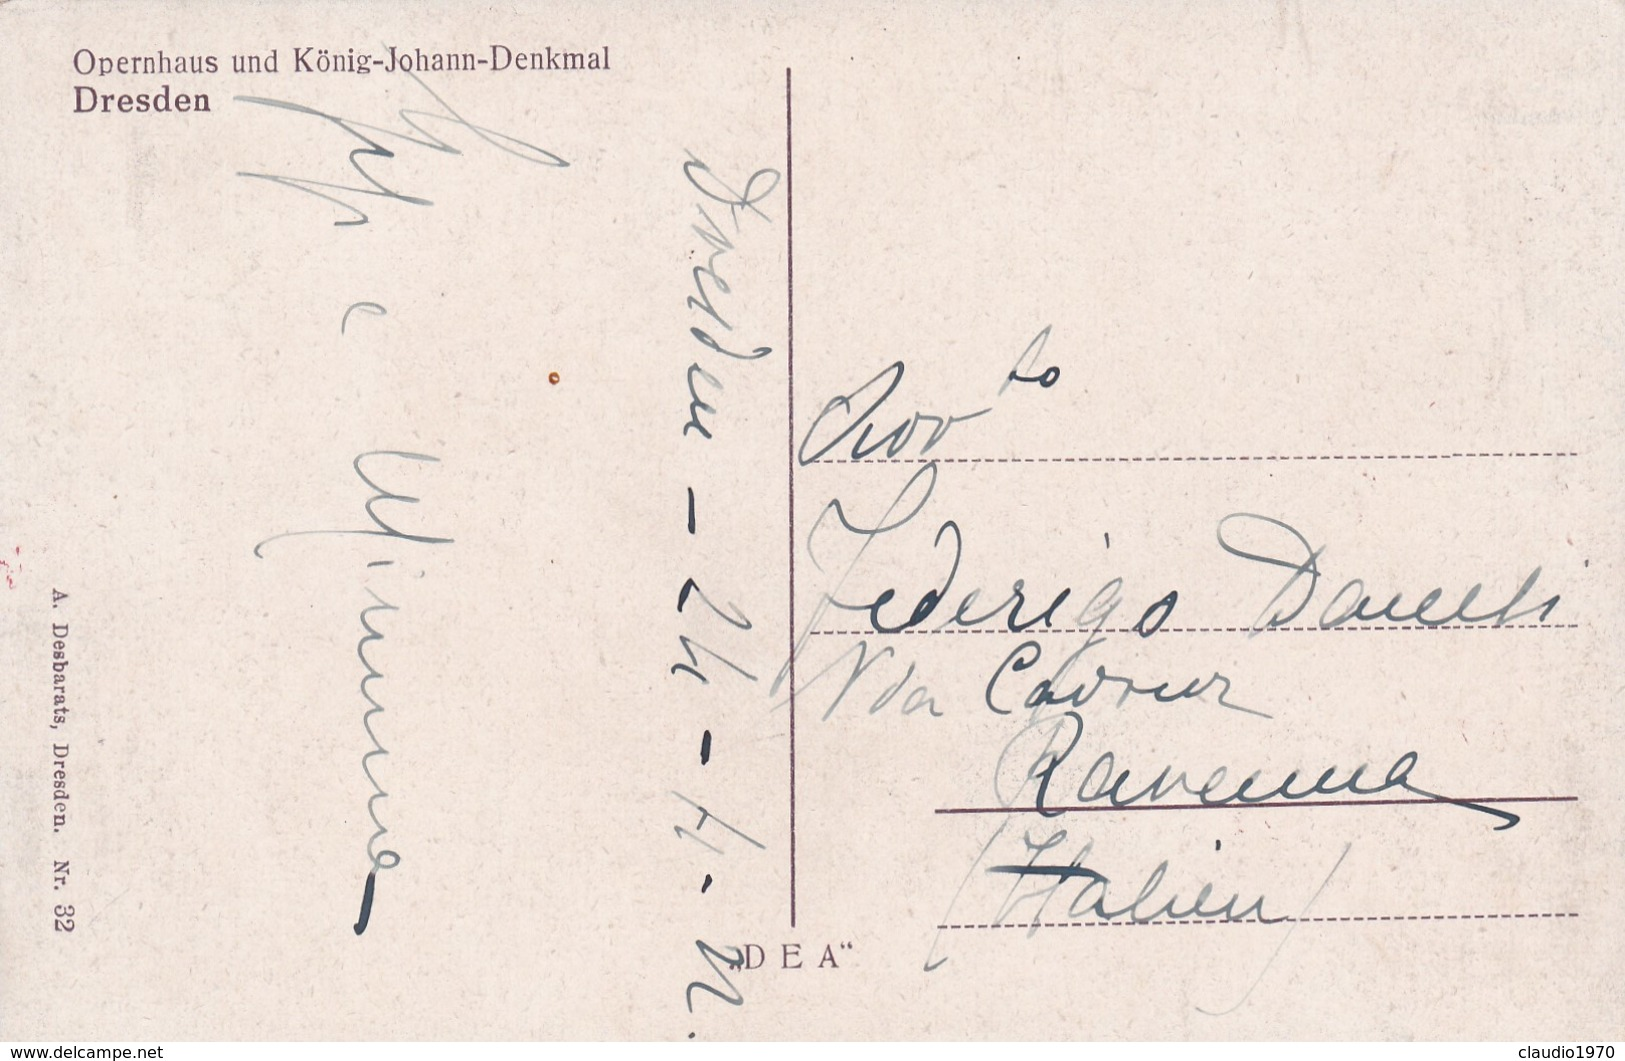 CARTOLINA - POSTCARD - DRESDEN - OPERNHAUS UND KONIG - JOHANN - DENKMAL - Dresden